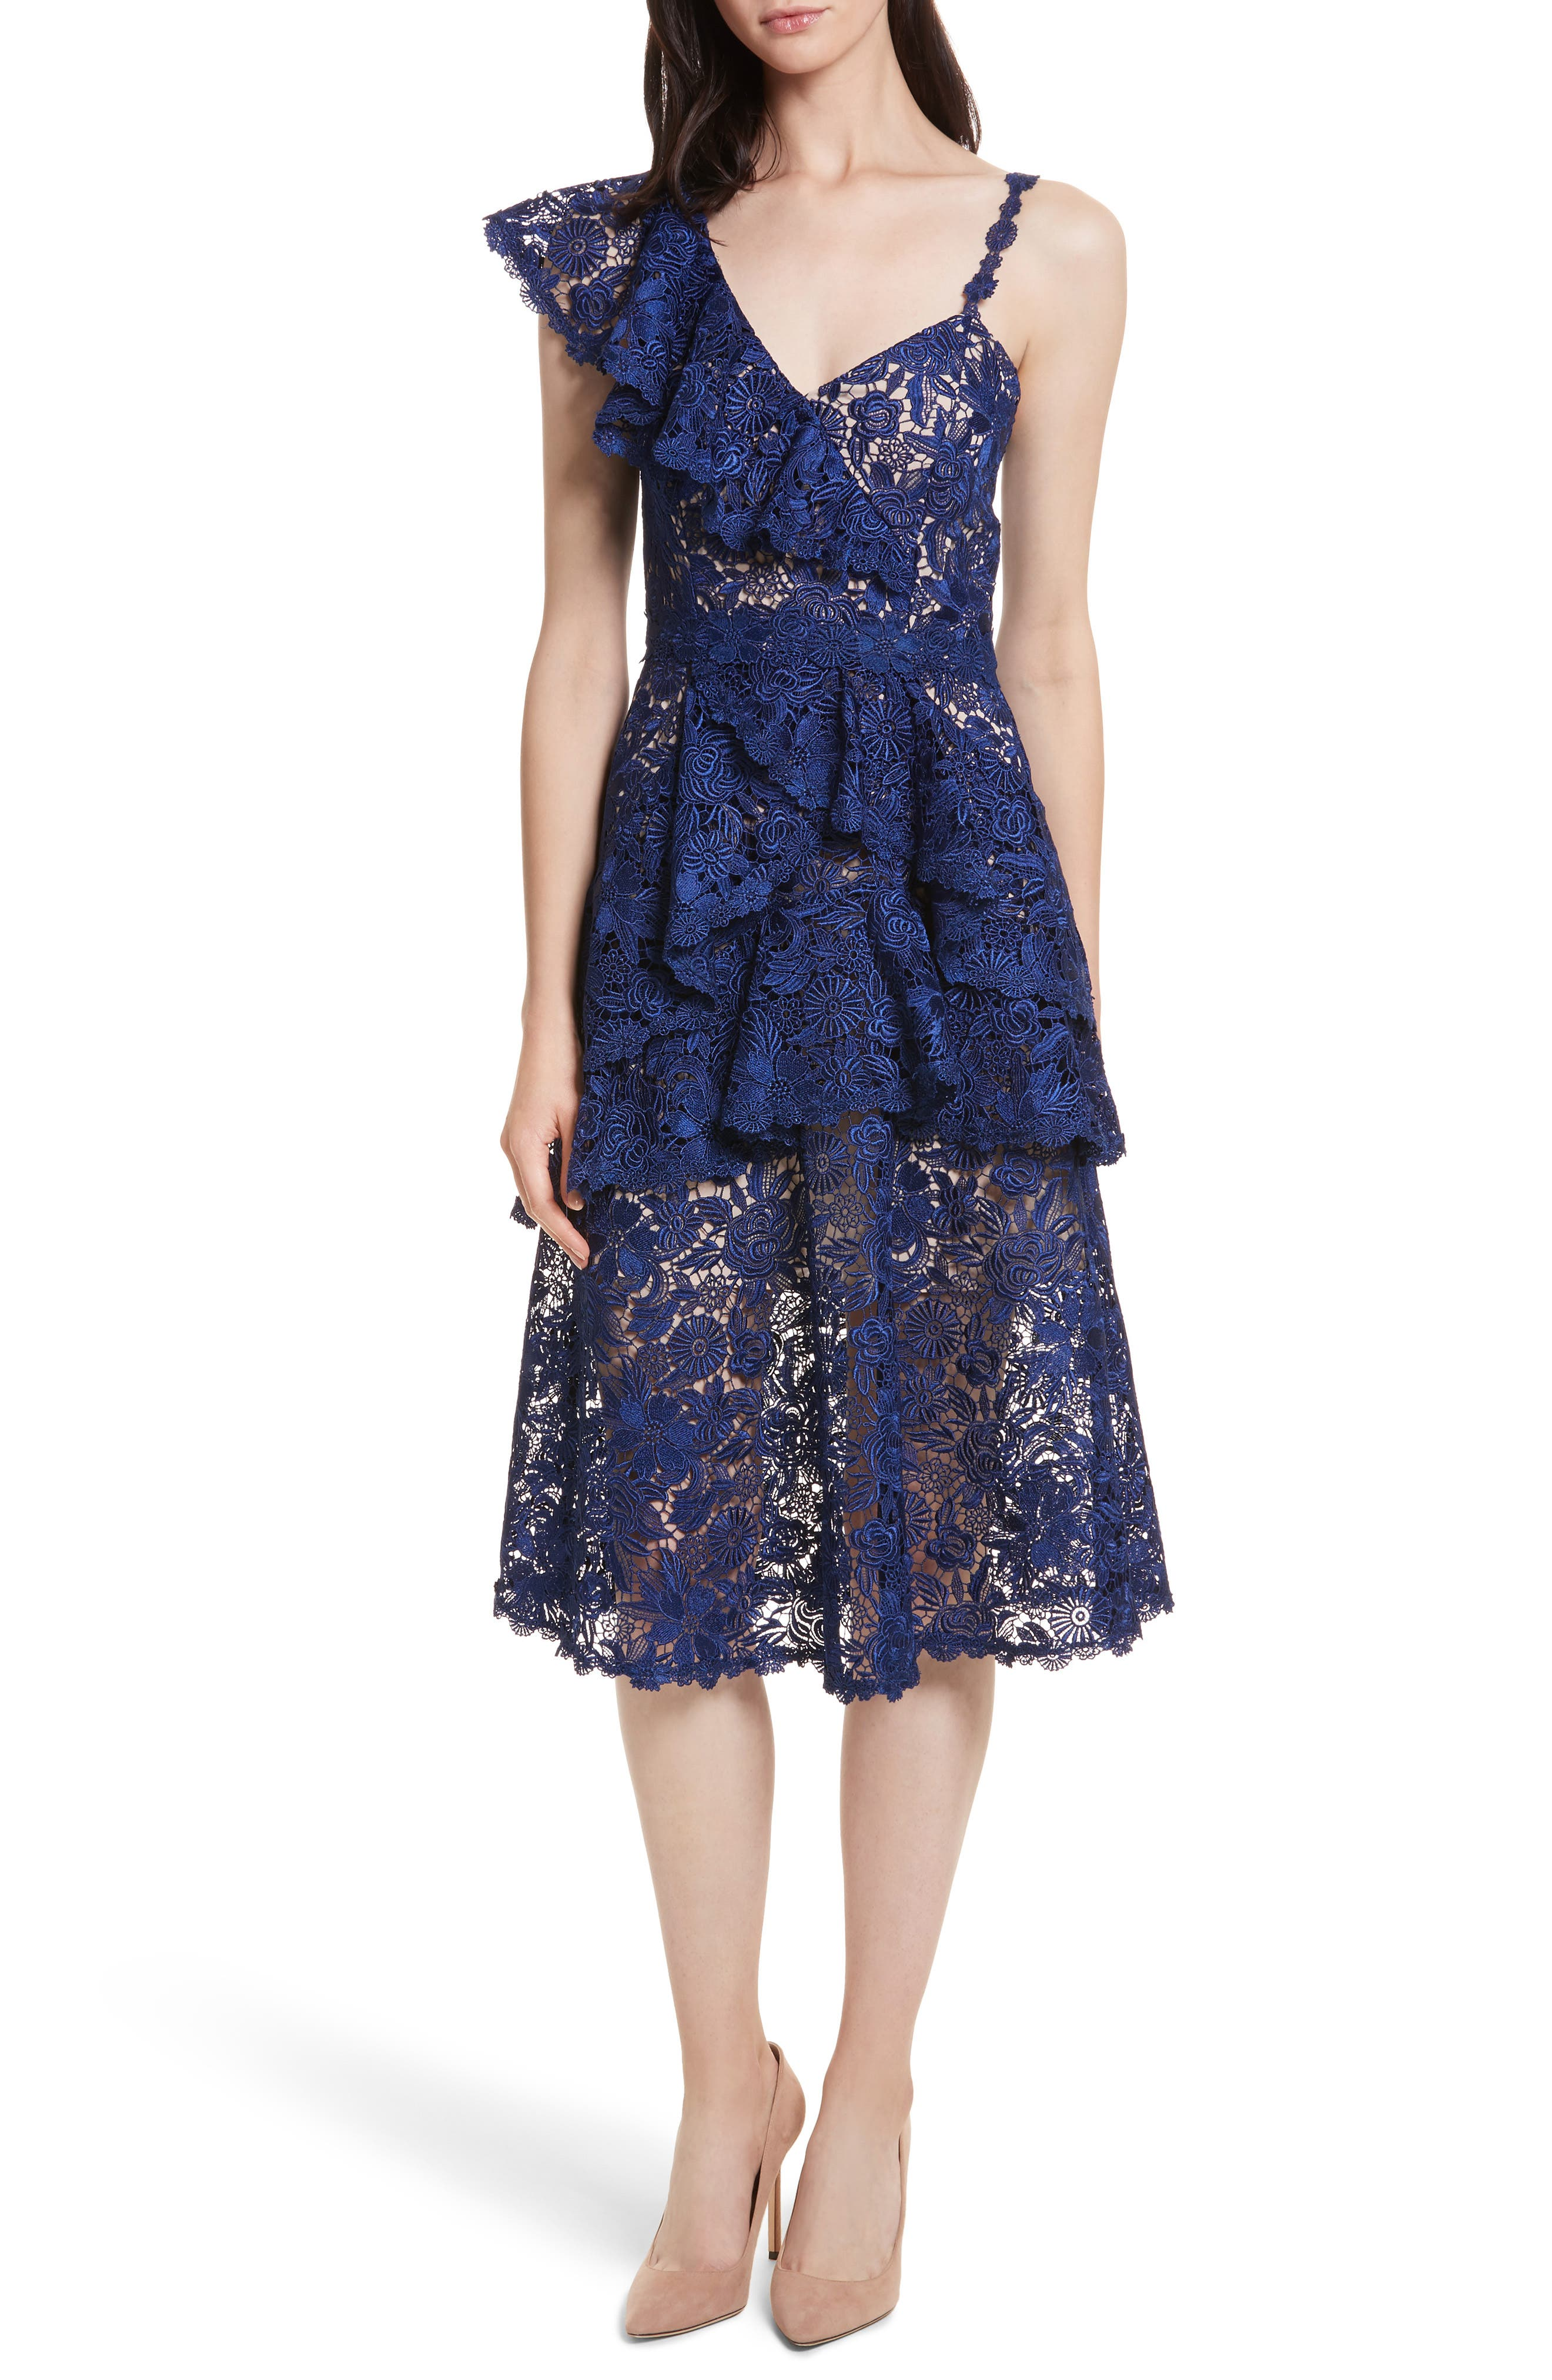 Florrie Ruffled Lace Midi Dress,                             Main thumbnail 1, color,                             Indigo/ Nude